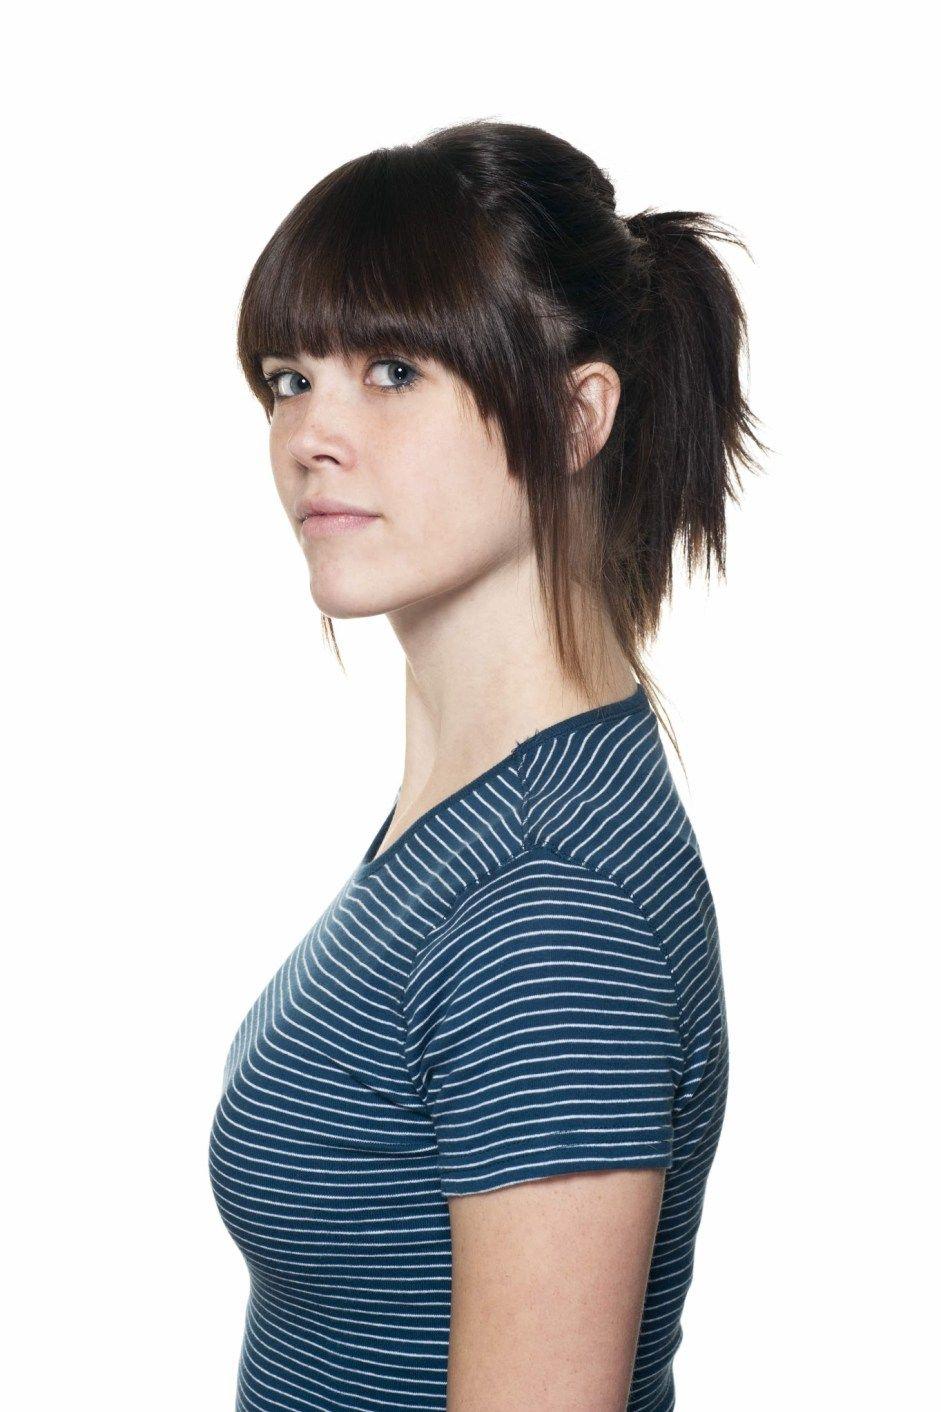 Emo fringe canadian girlhow to cut micro bangs beauty